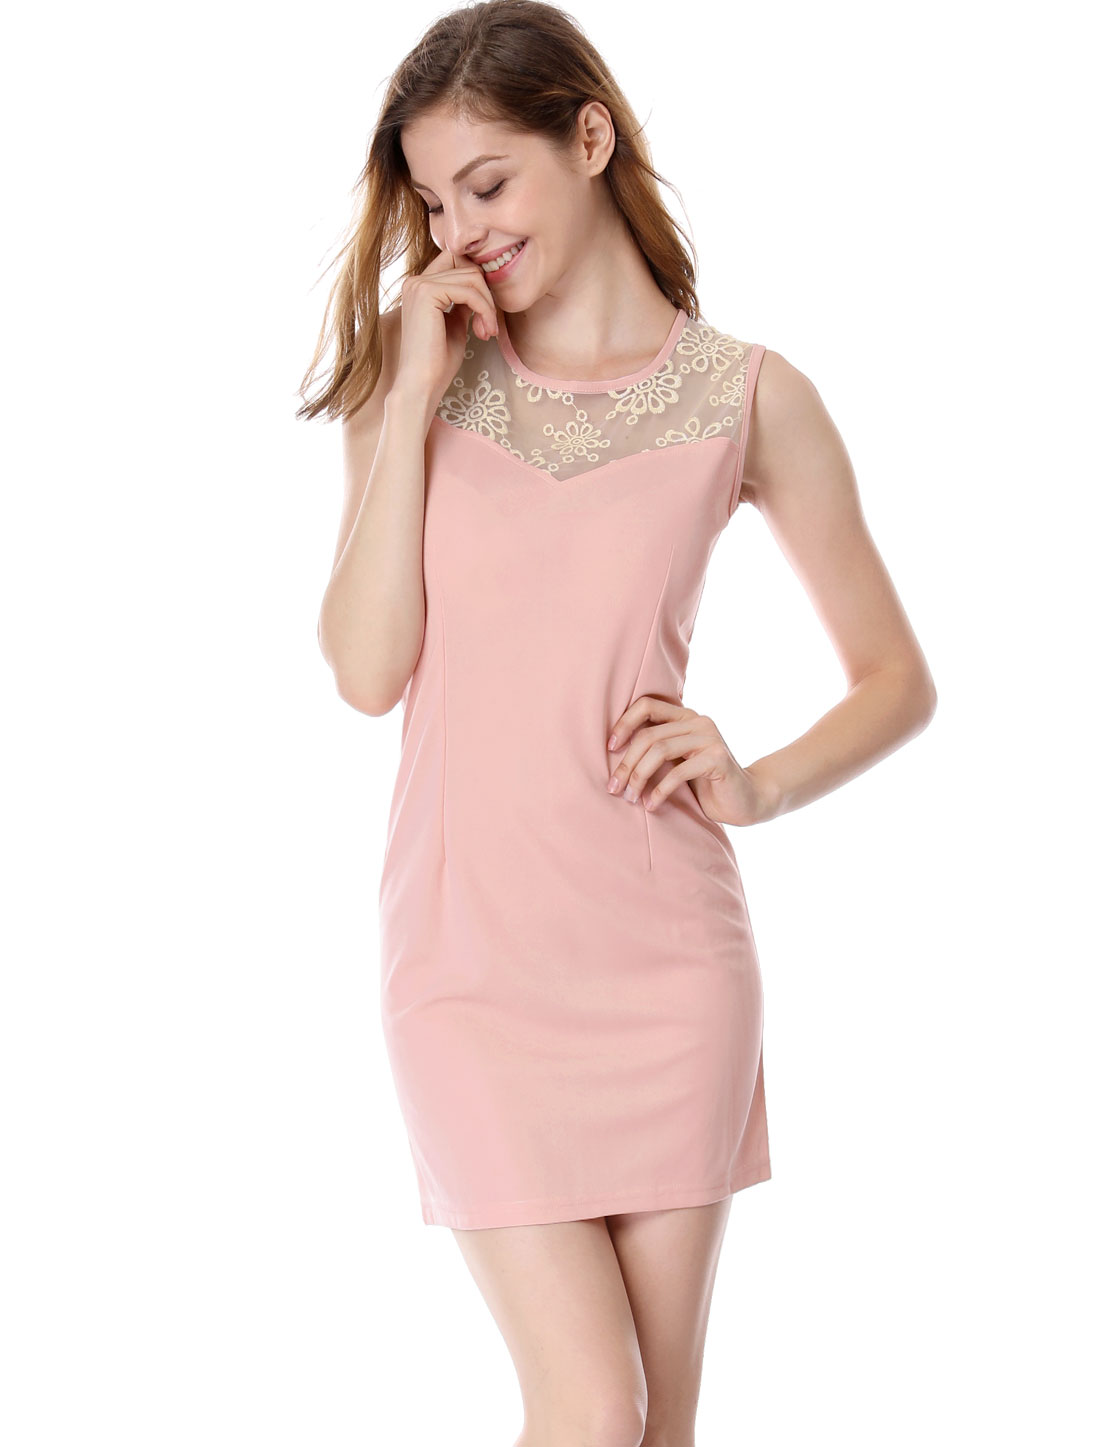 Ladies Pretty Pale Pink Crochet Flower Design Slimming Mini Dress L